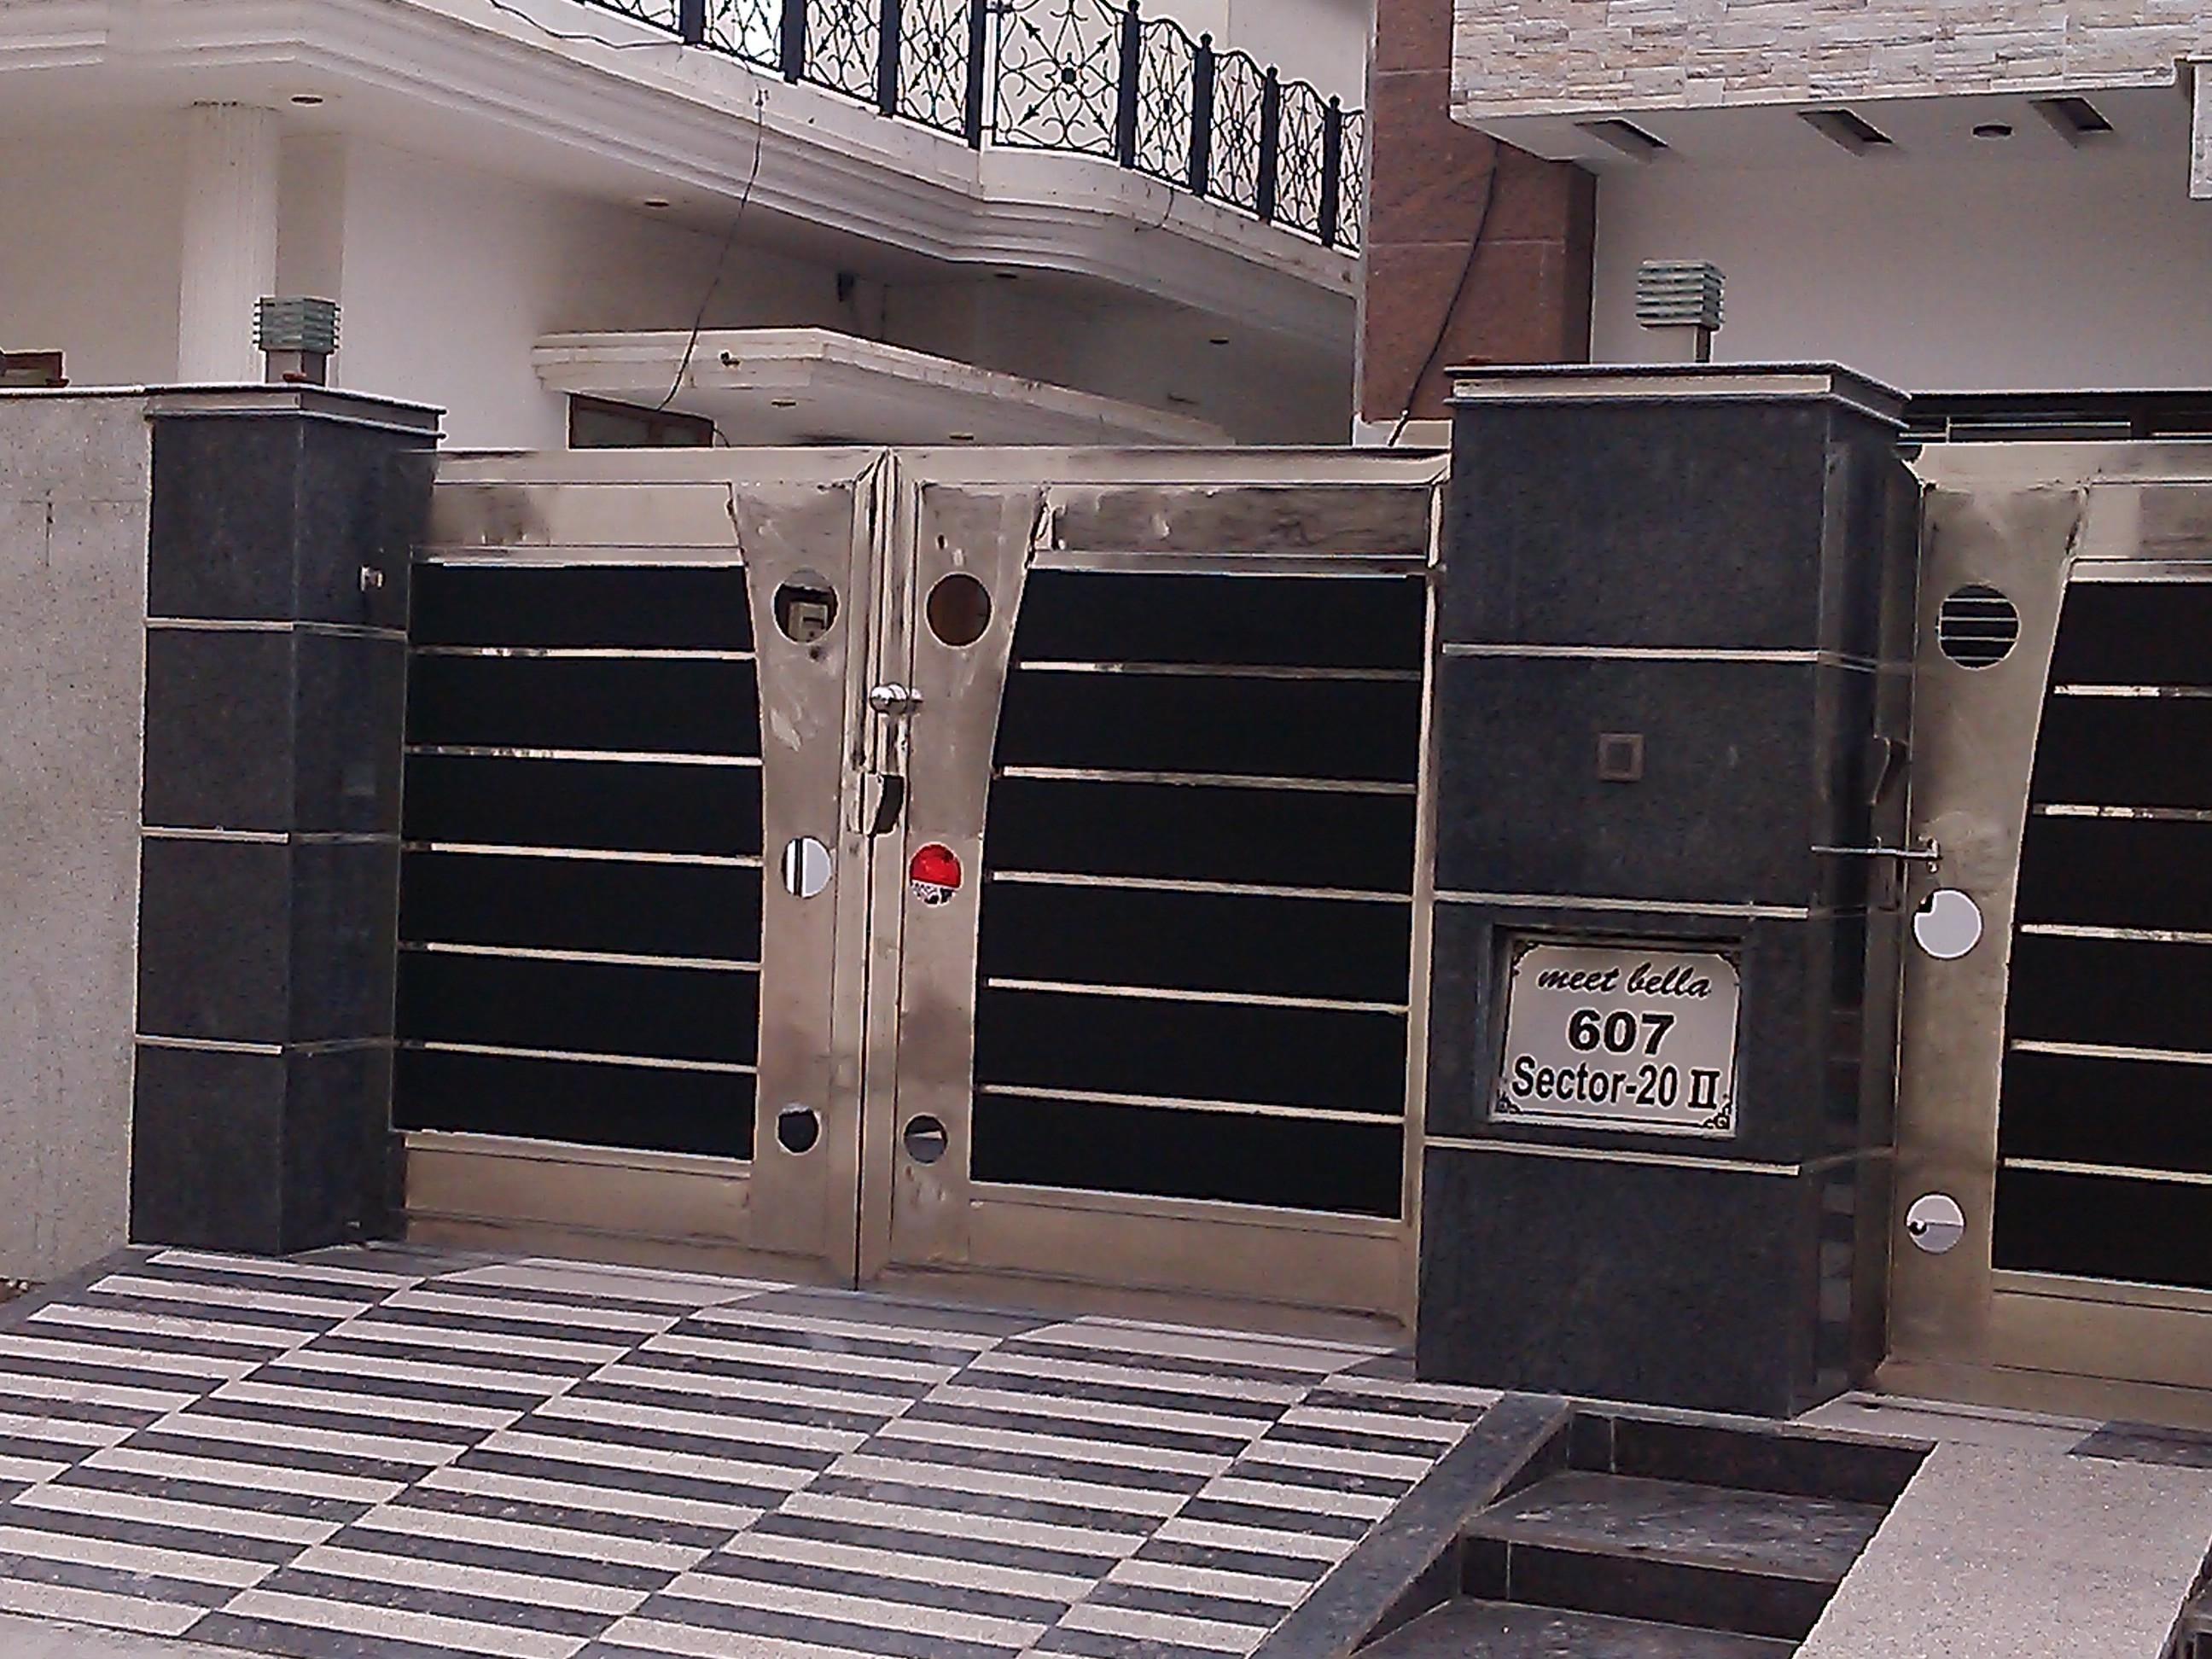 Steel Grill Gate  Window Services in MeerutModinagarGhaziabad Etc  Steel Grill in Meerut